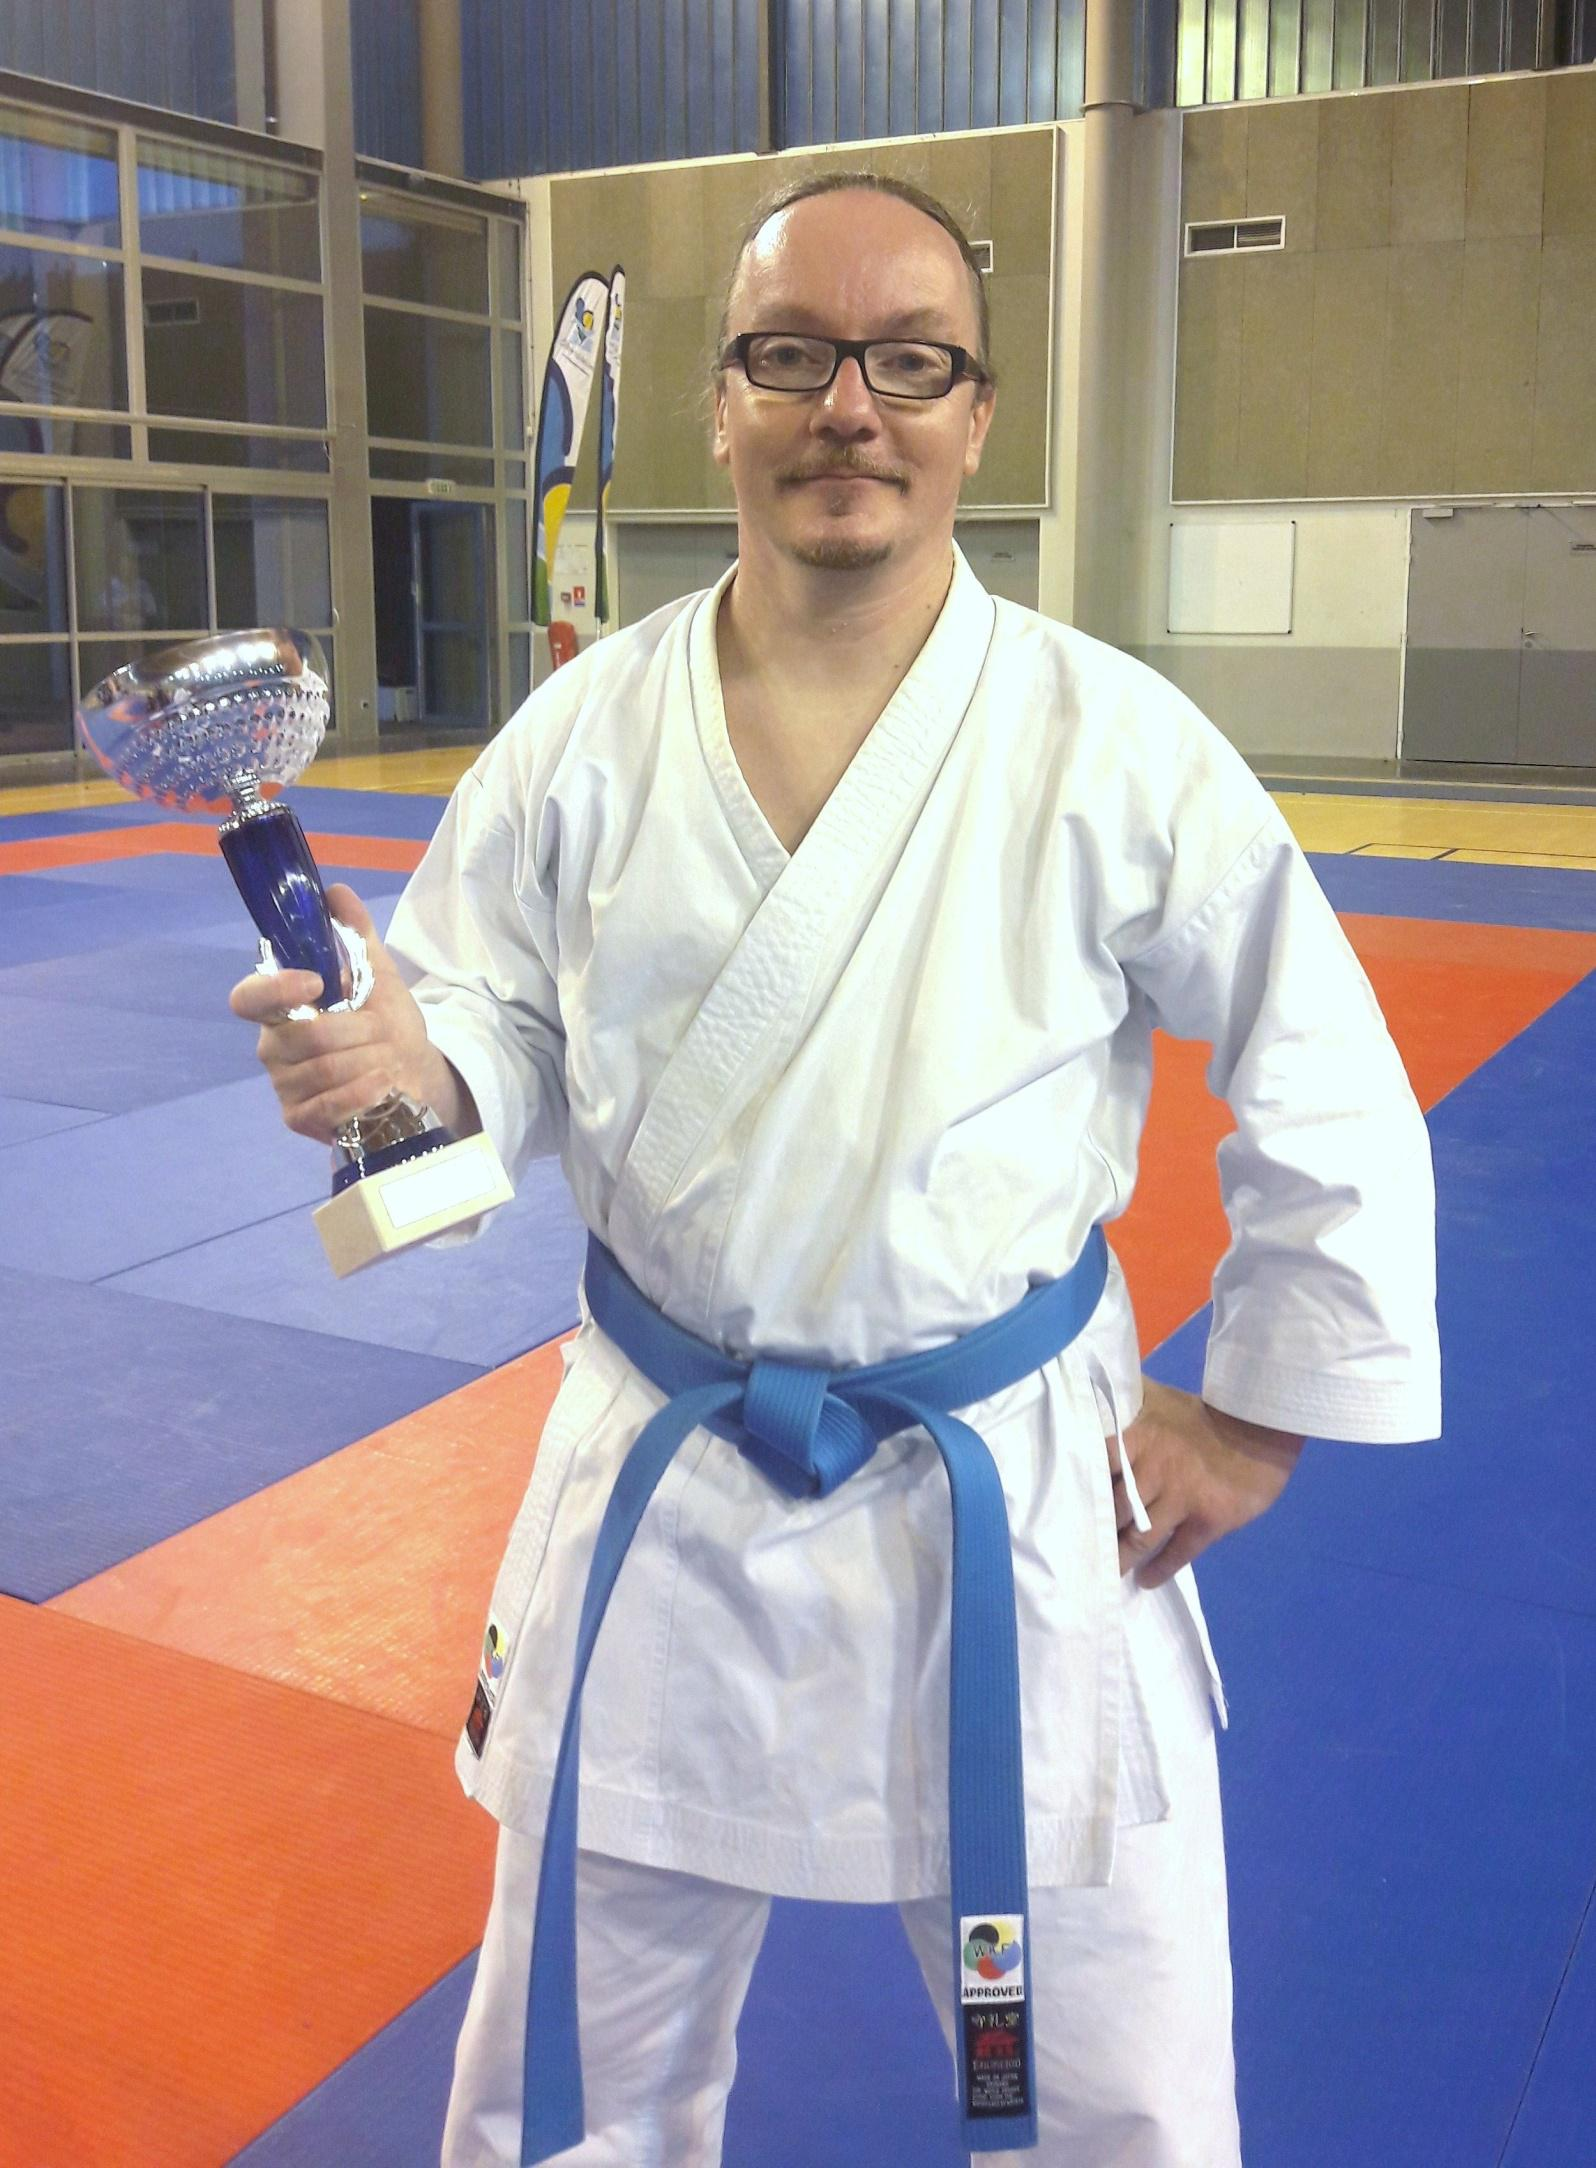 Sebastien Arlot champion de France Karaté Shotokan 2018 professeur AS KARATE DO